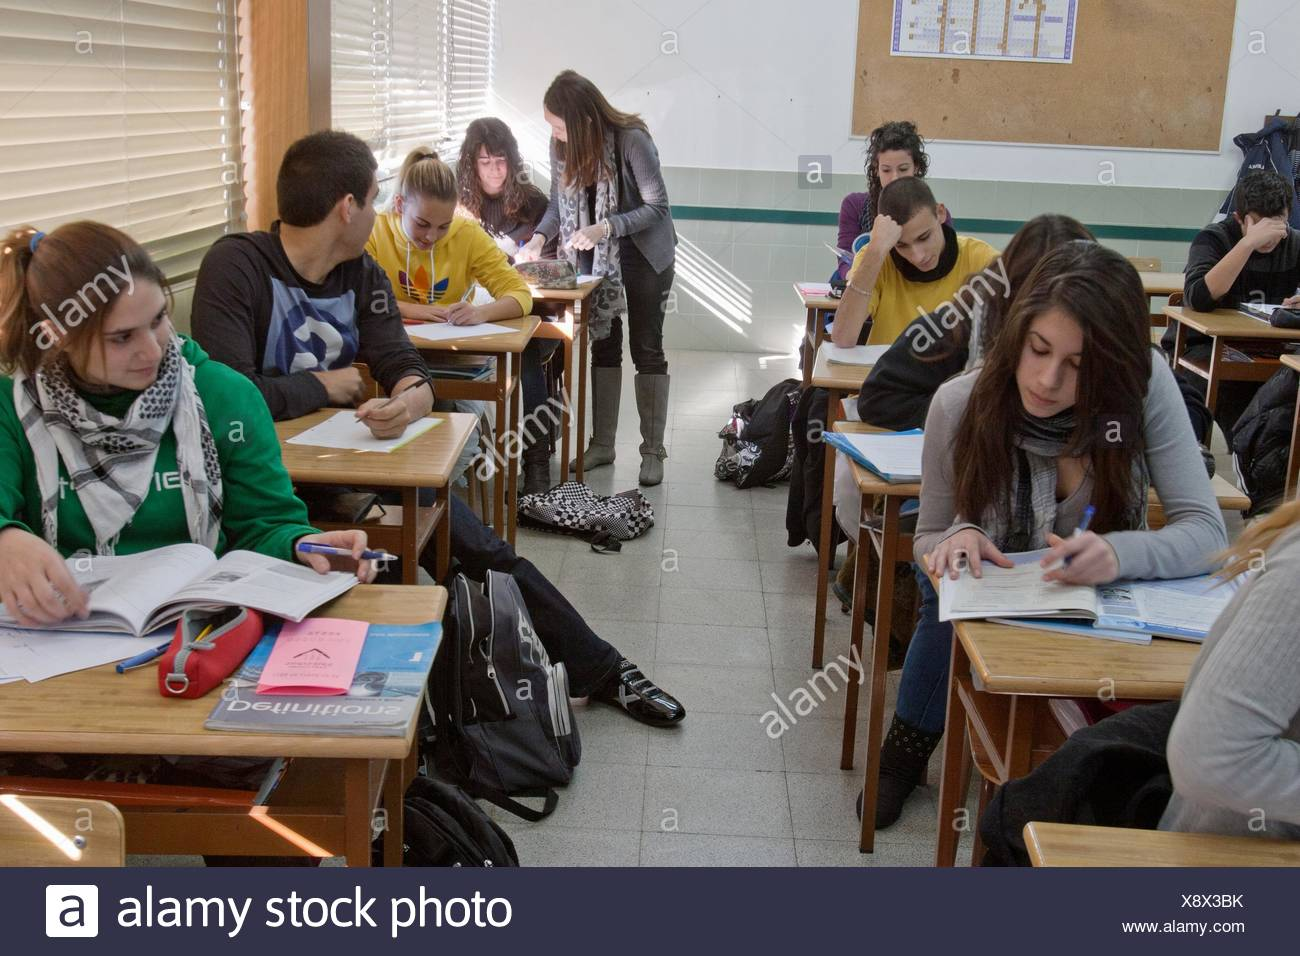 Secundary School, Salesians Sant Vicenç dels Horts, Baix Llobregat, Barcelona, Catalonia, Spain Stock Photo